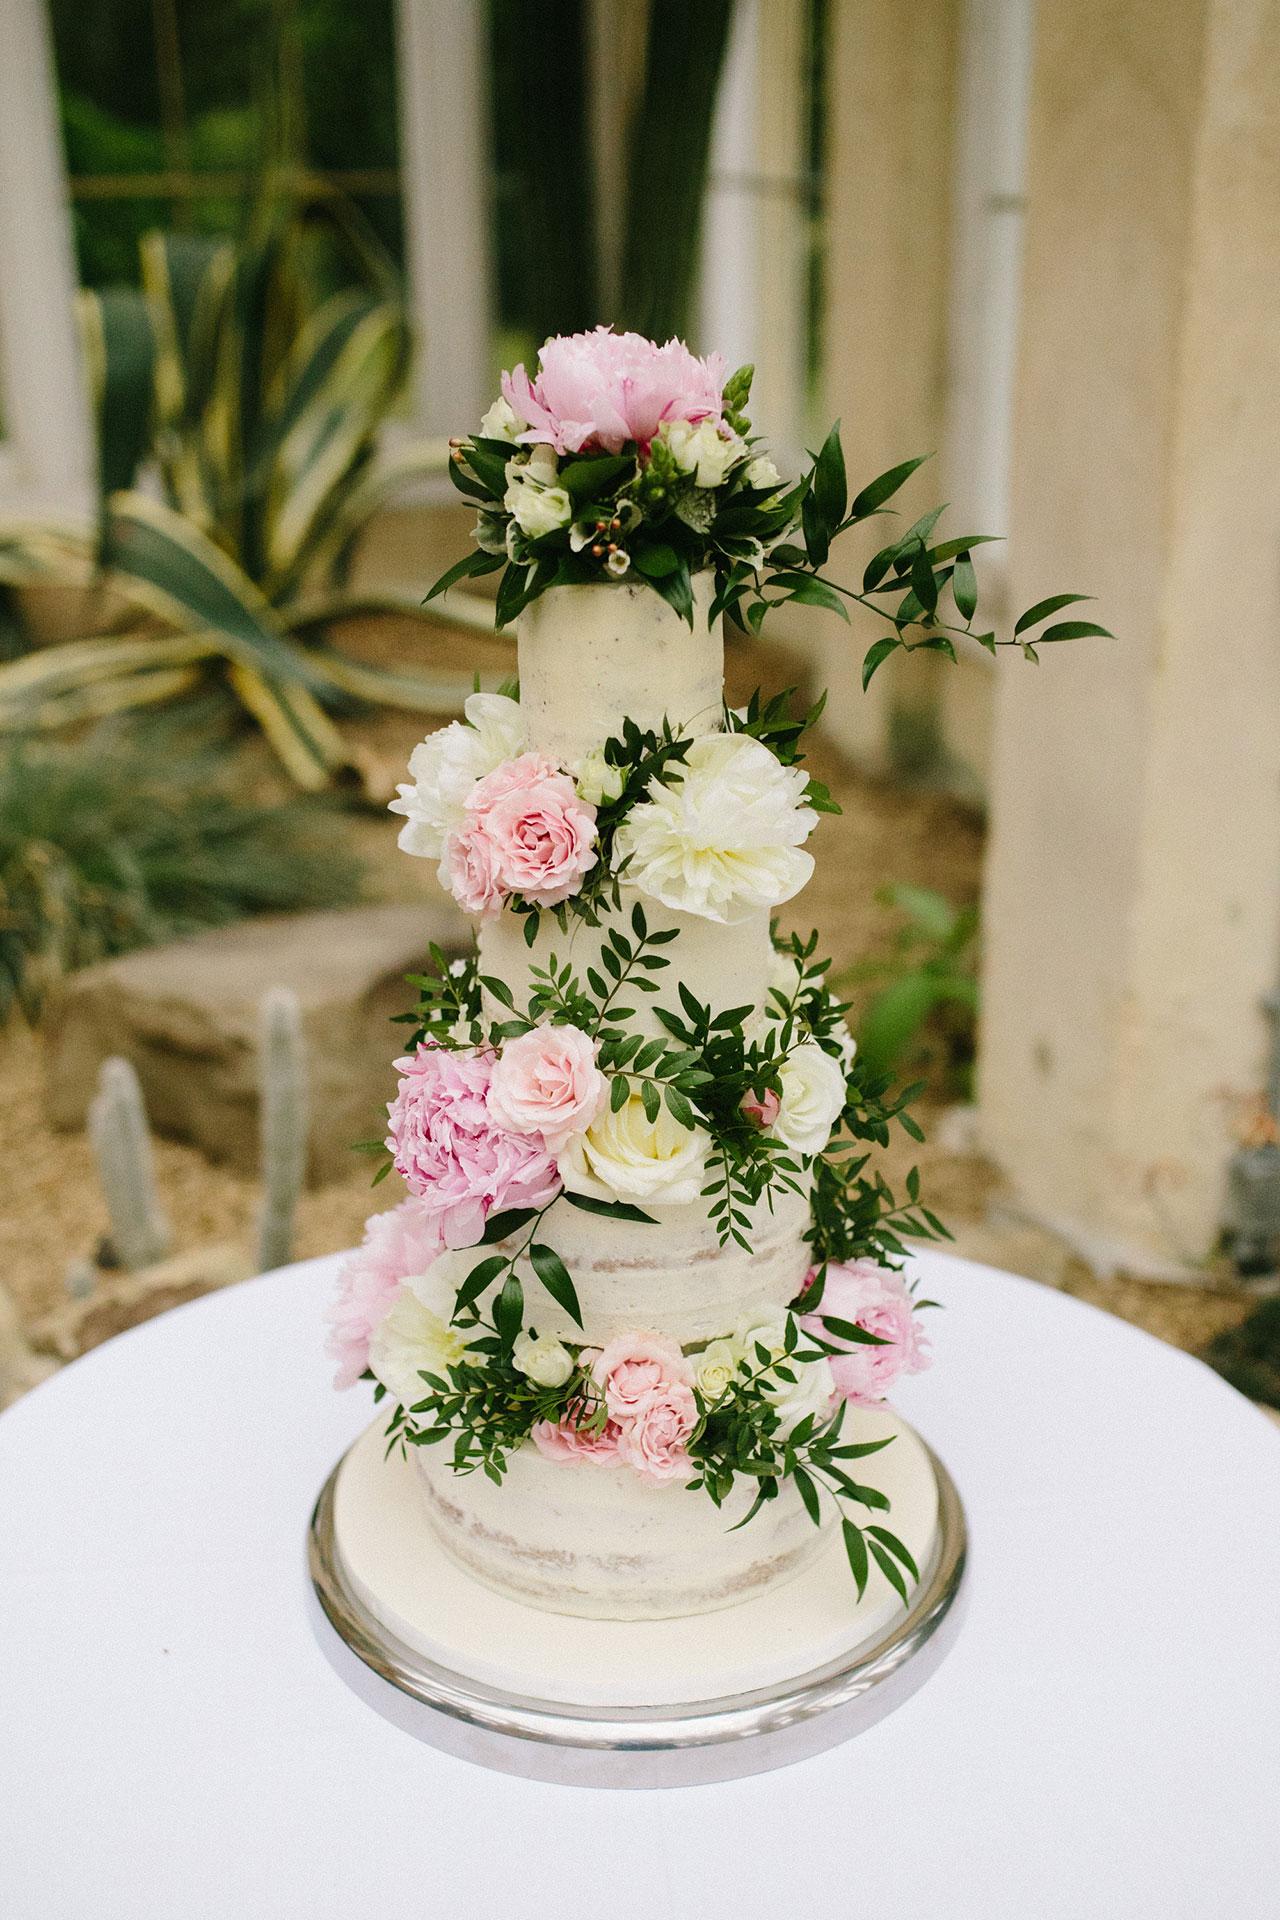 Syon-Park-Wedding-Photographer--_-Michael-Newington-Gray-607.jpg